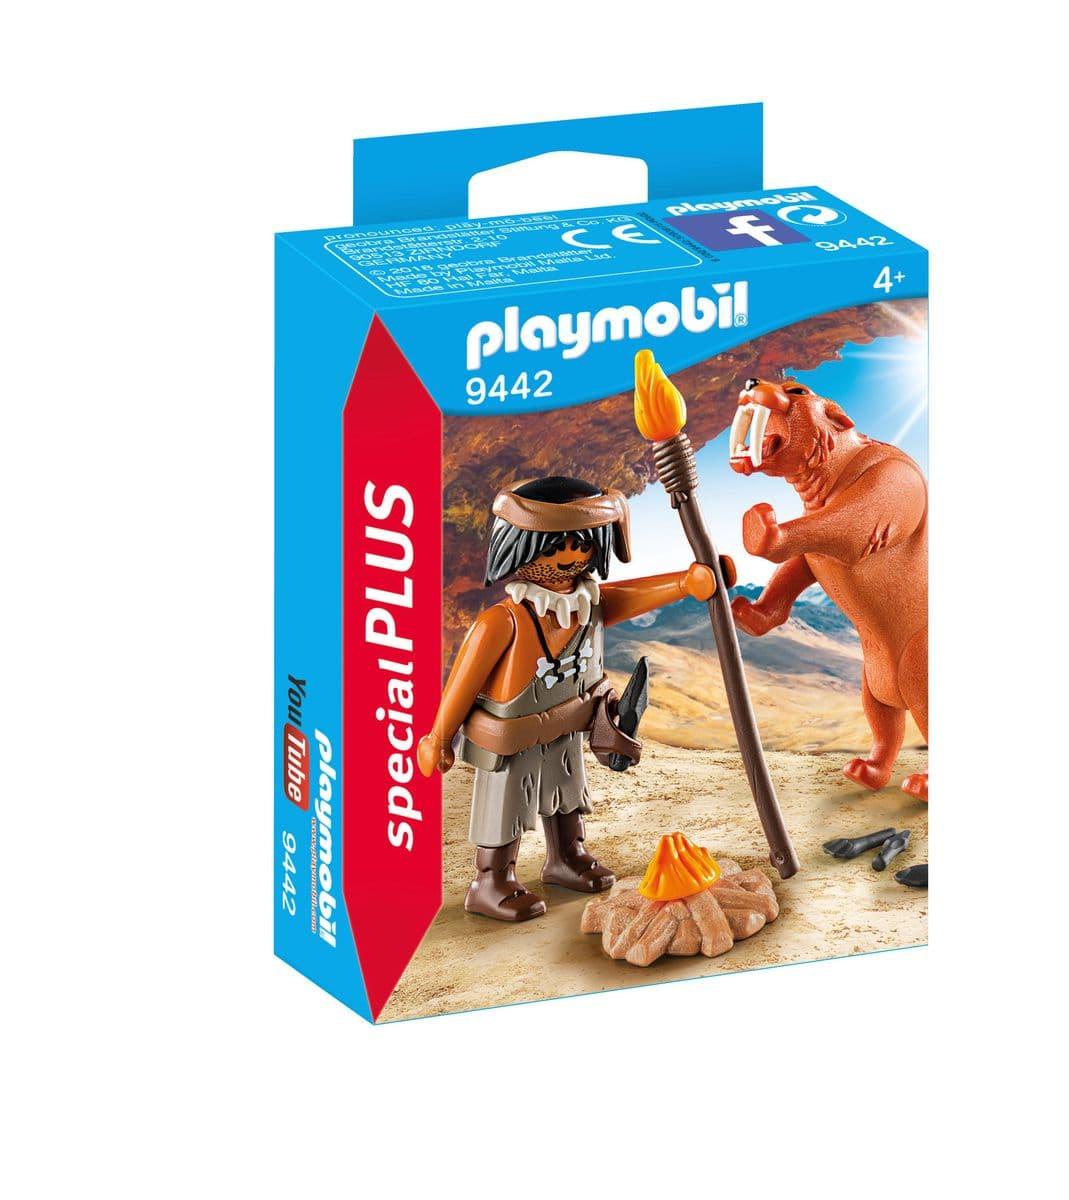 Playmobil Uomo preistorico con tigre